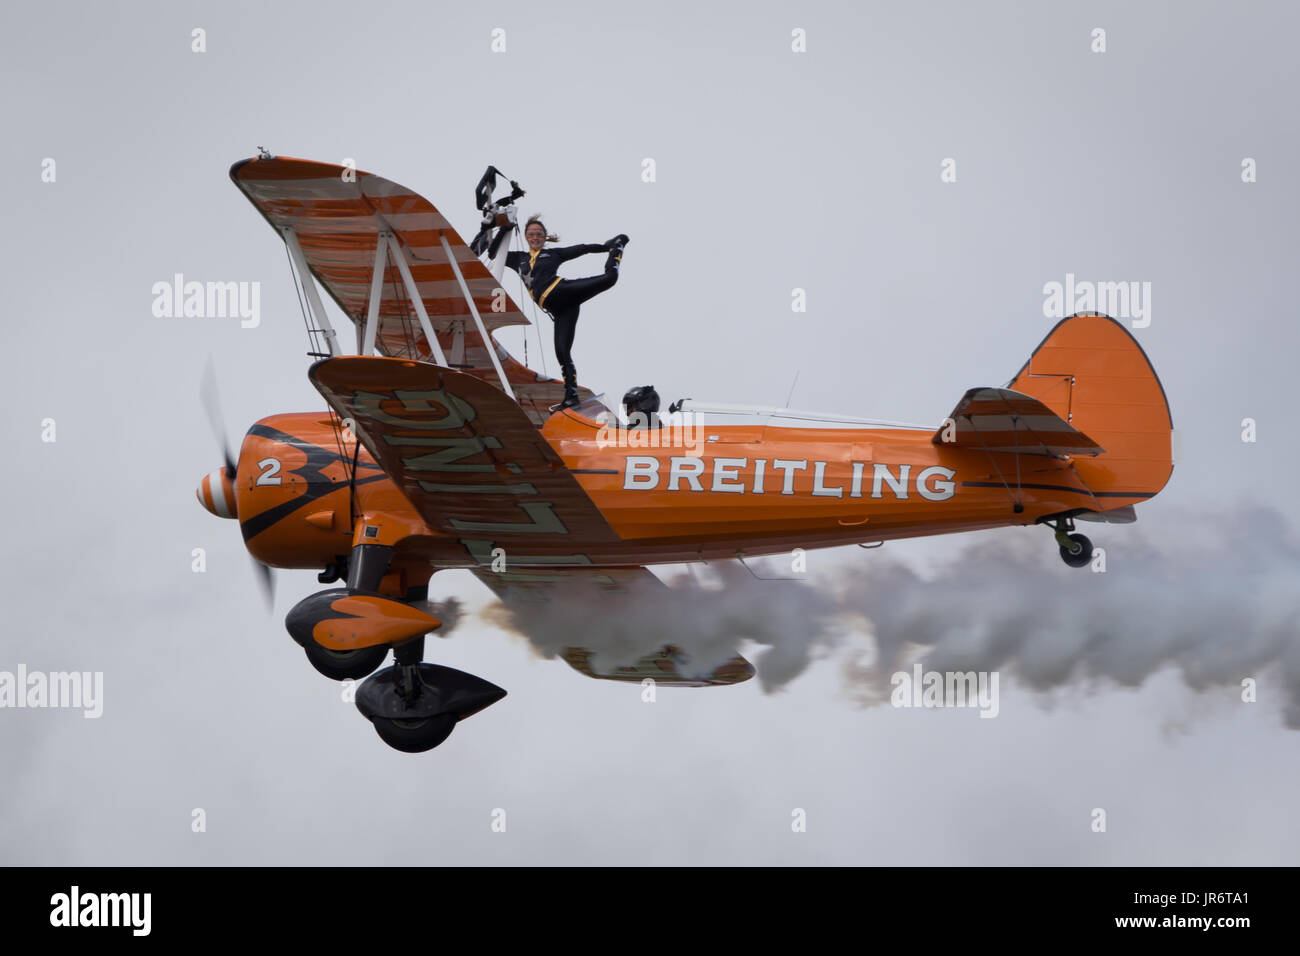 Fairford, Gloucestershire, UK - July 10th, 2016: AeroSuperBatics Breitling Stearman Wing Walking Formation Display Team - Stock Image